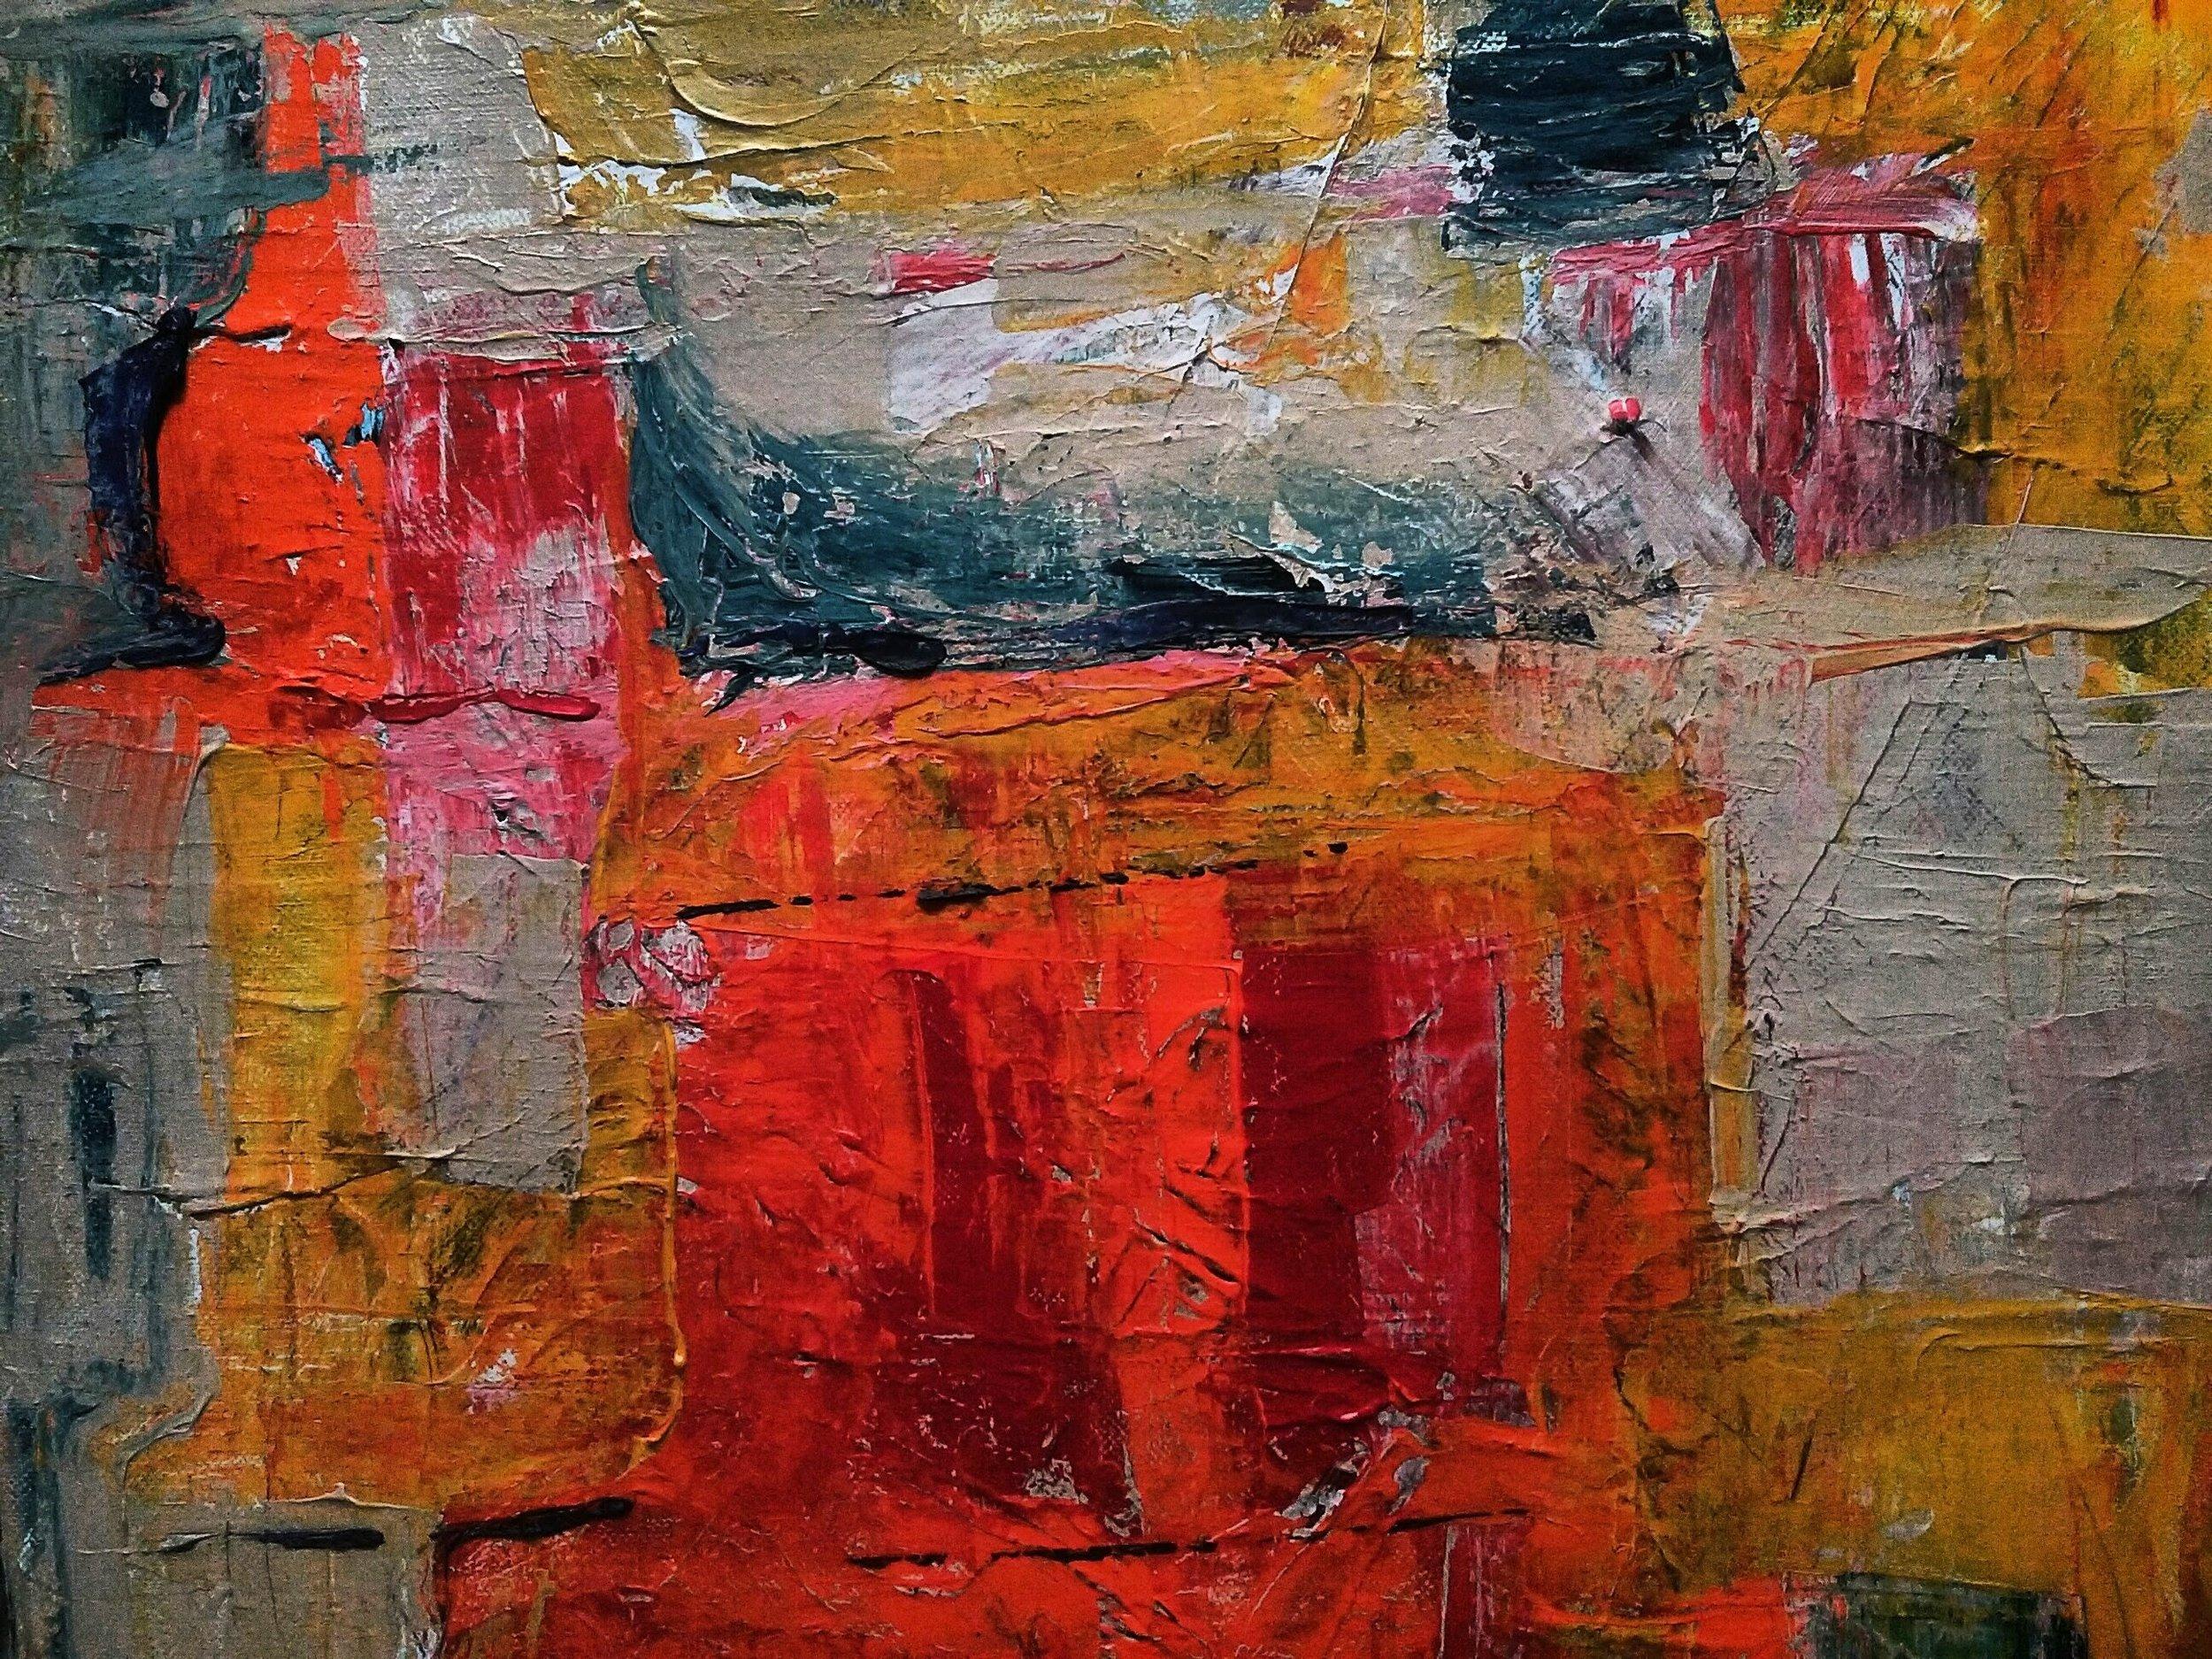 abstract-acrylic-art-1023974.jpg